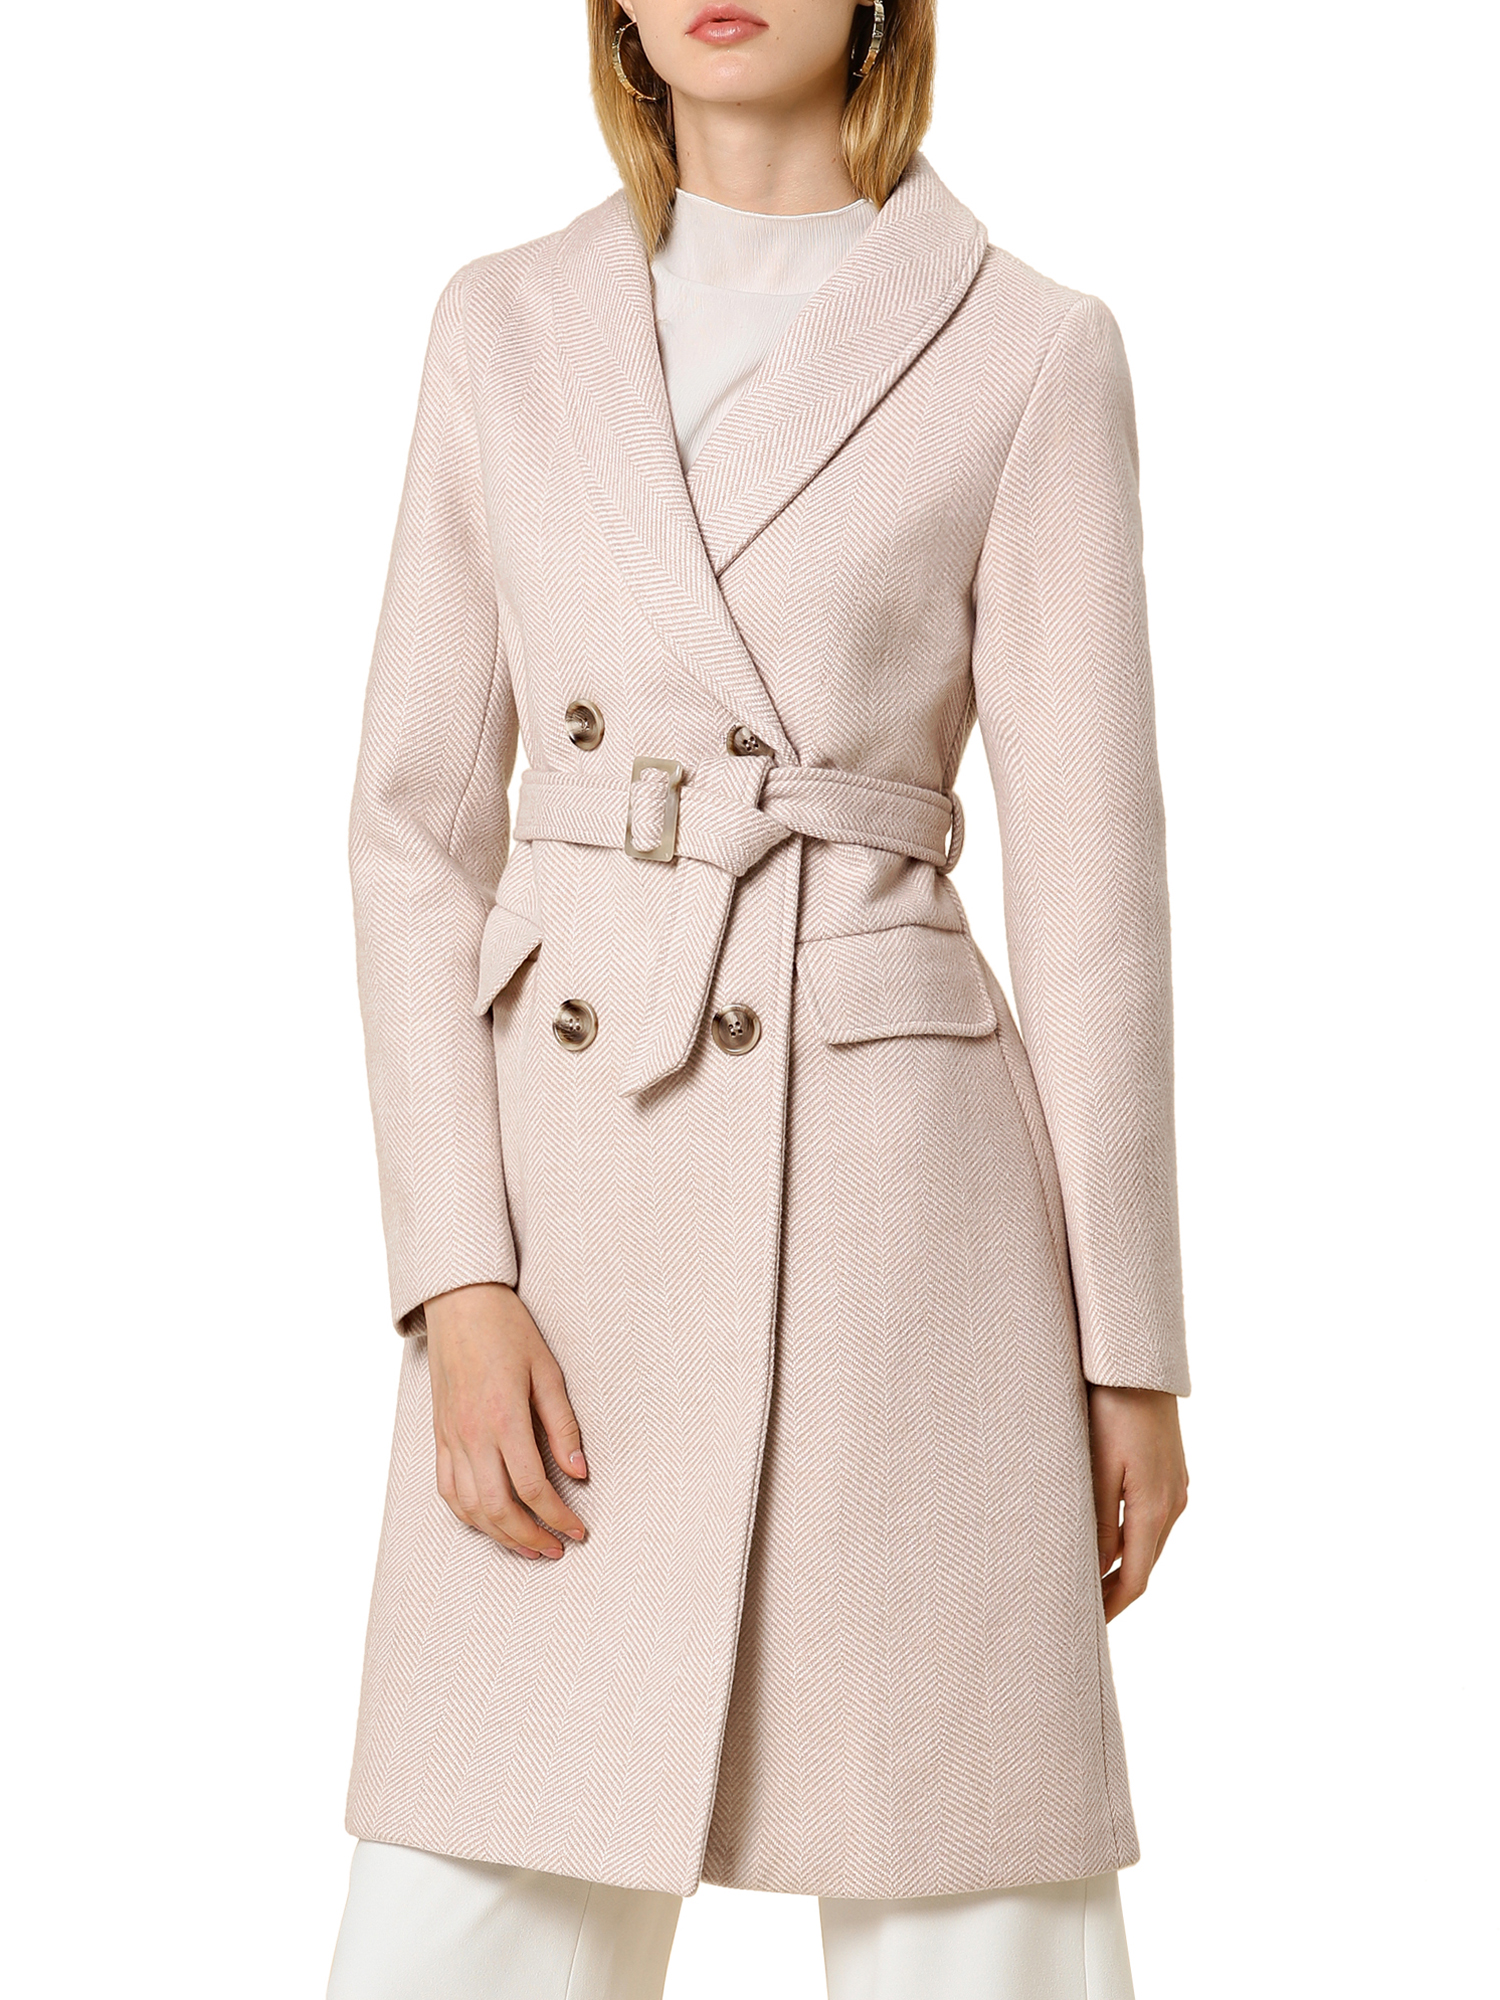 Allegra K Women's Double Breasted Belted Lapel Long Wool Coat Apricot S (US 6)